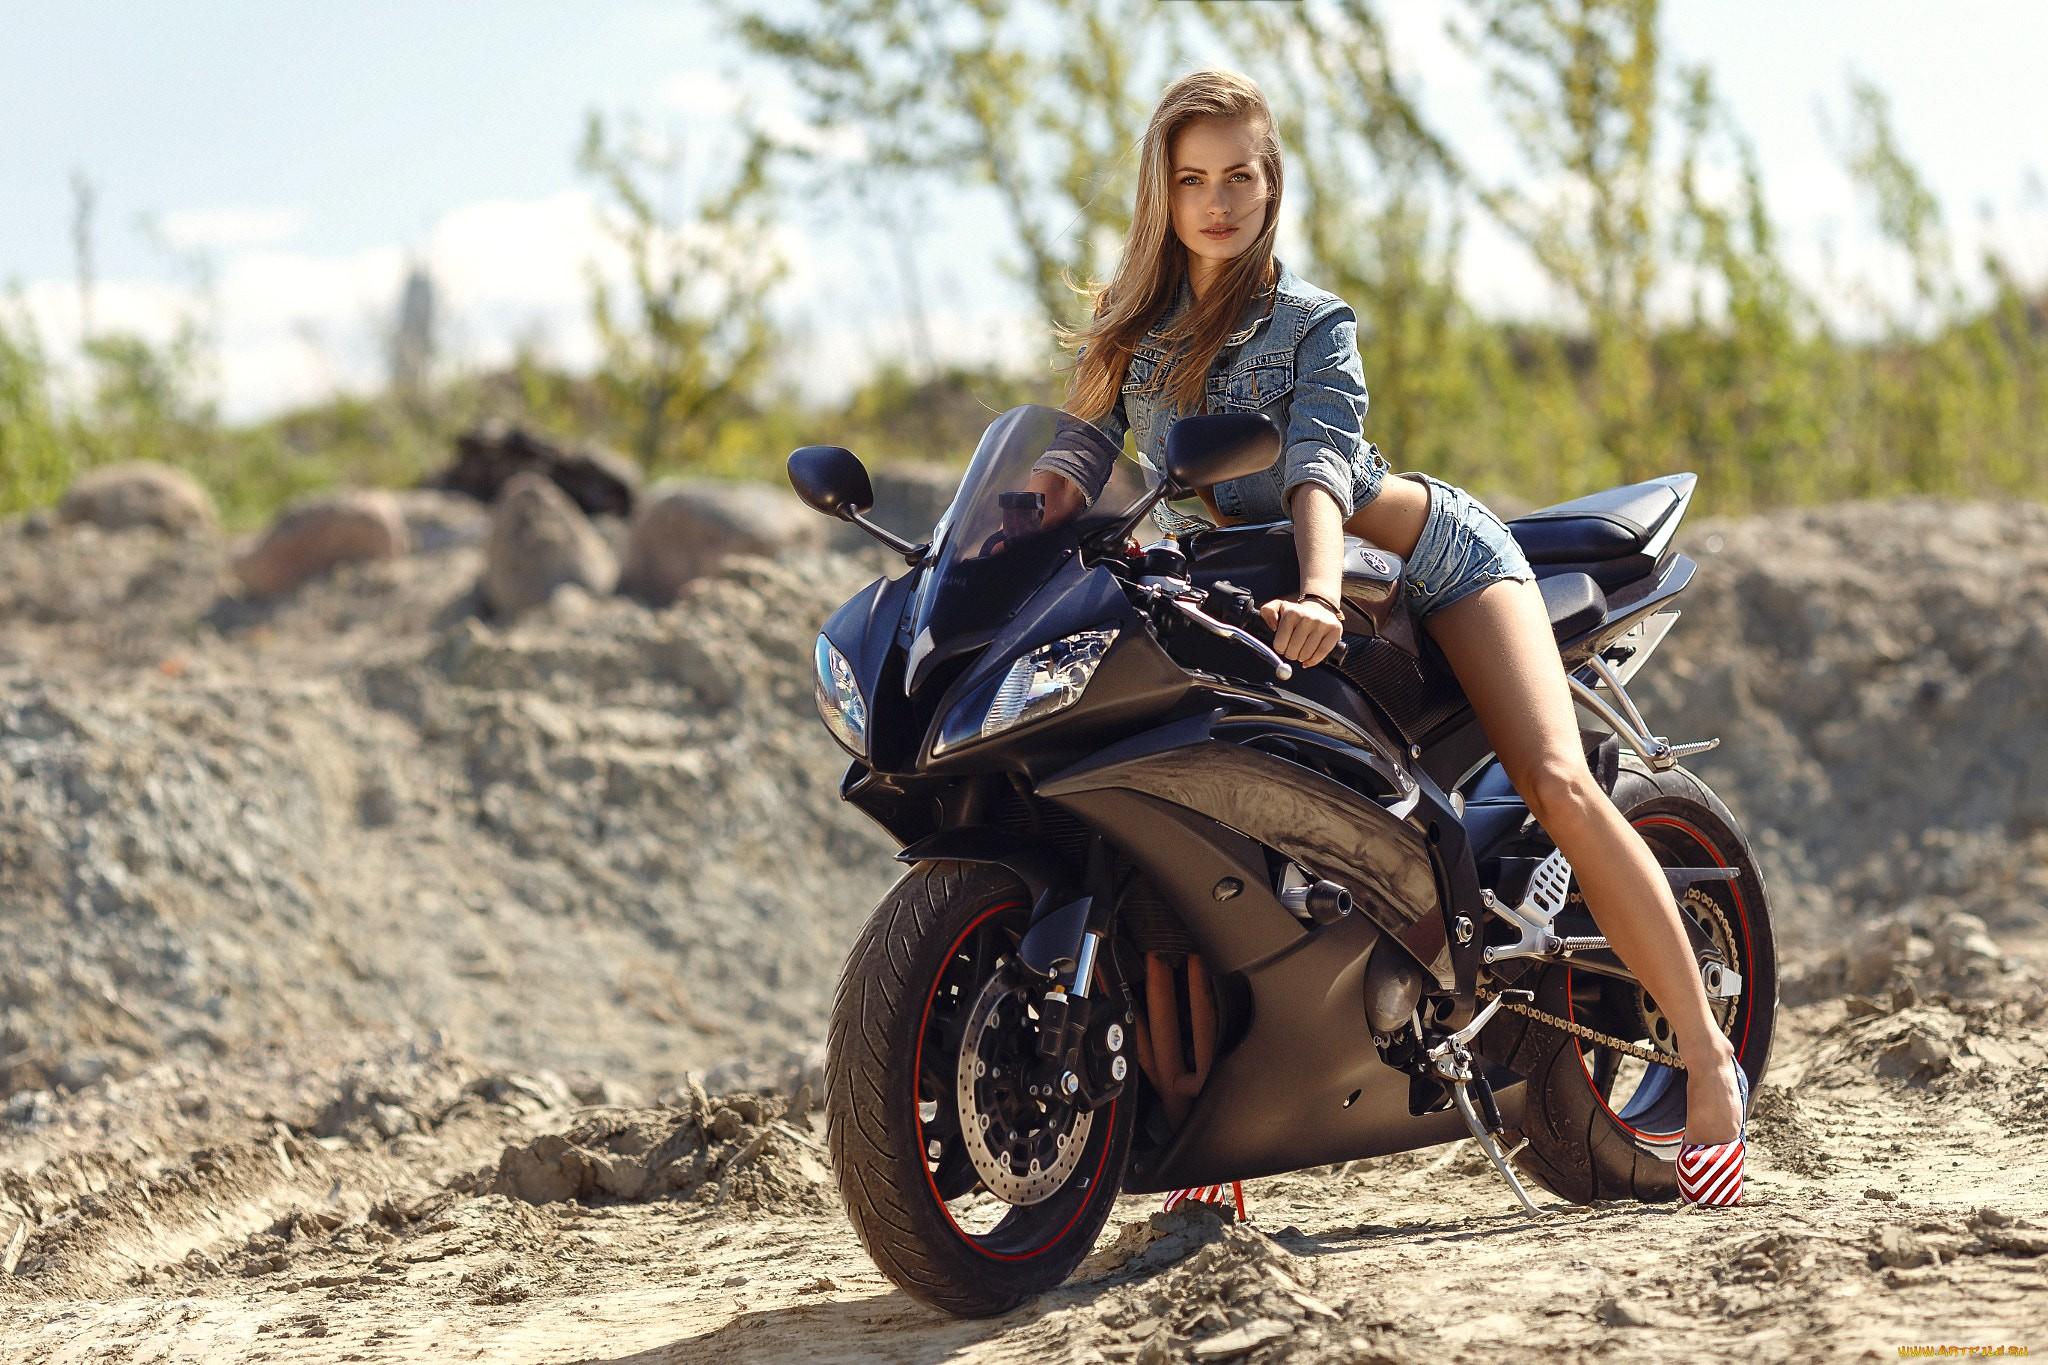 Hintergrundbilder : Motorrad, Frauen mit Fahrrädern